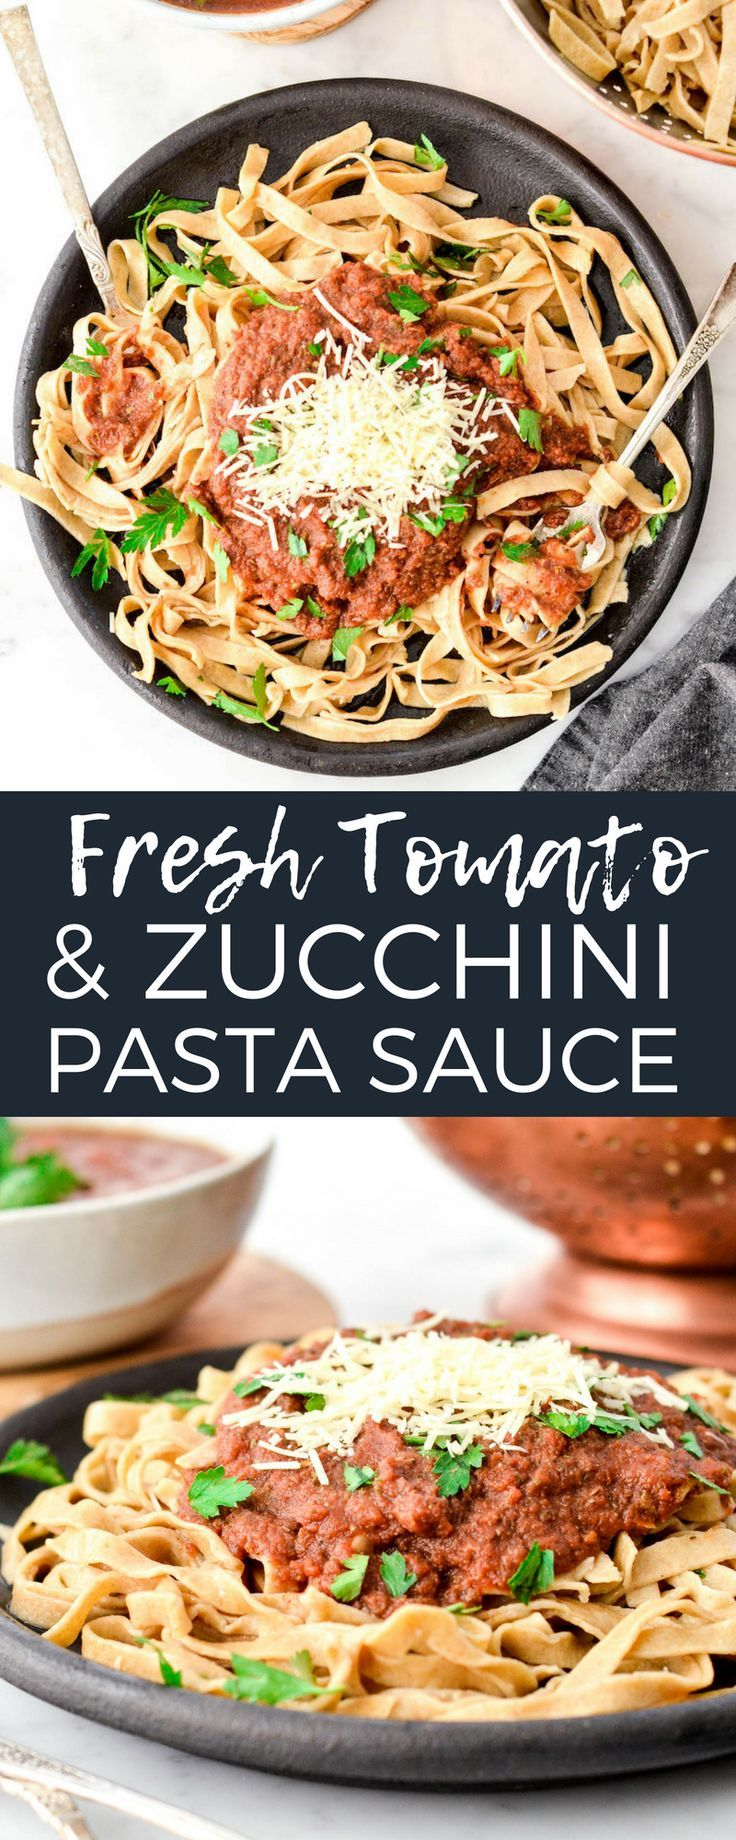 Fresh Tomato Zucchini Pasta Sauce Made In The Blender A Versatile Marinara Sauce That Is Loa Zucchini Pasta Sauce Pasta Sauce Recipes Healthy Homemade Pizza